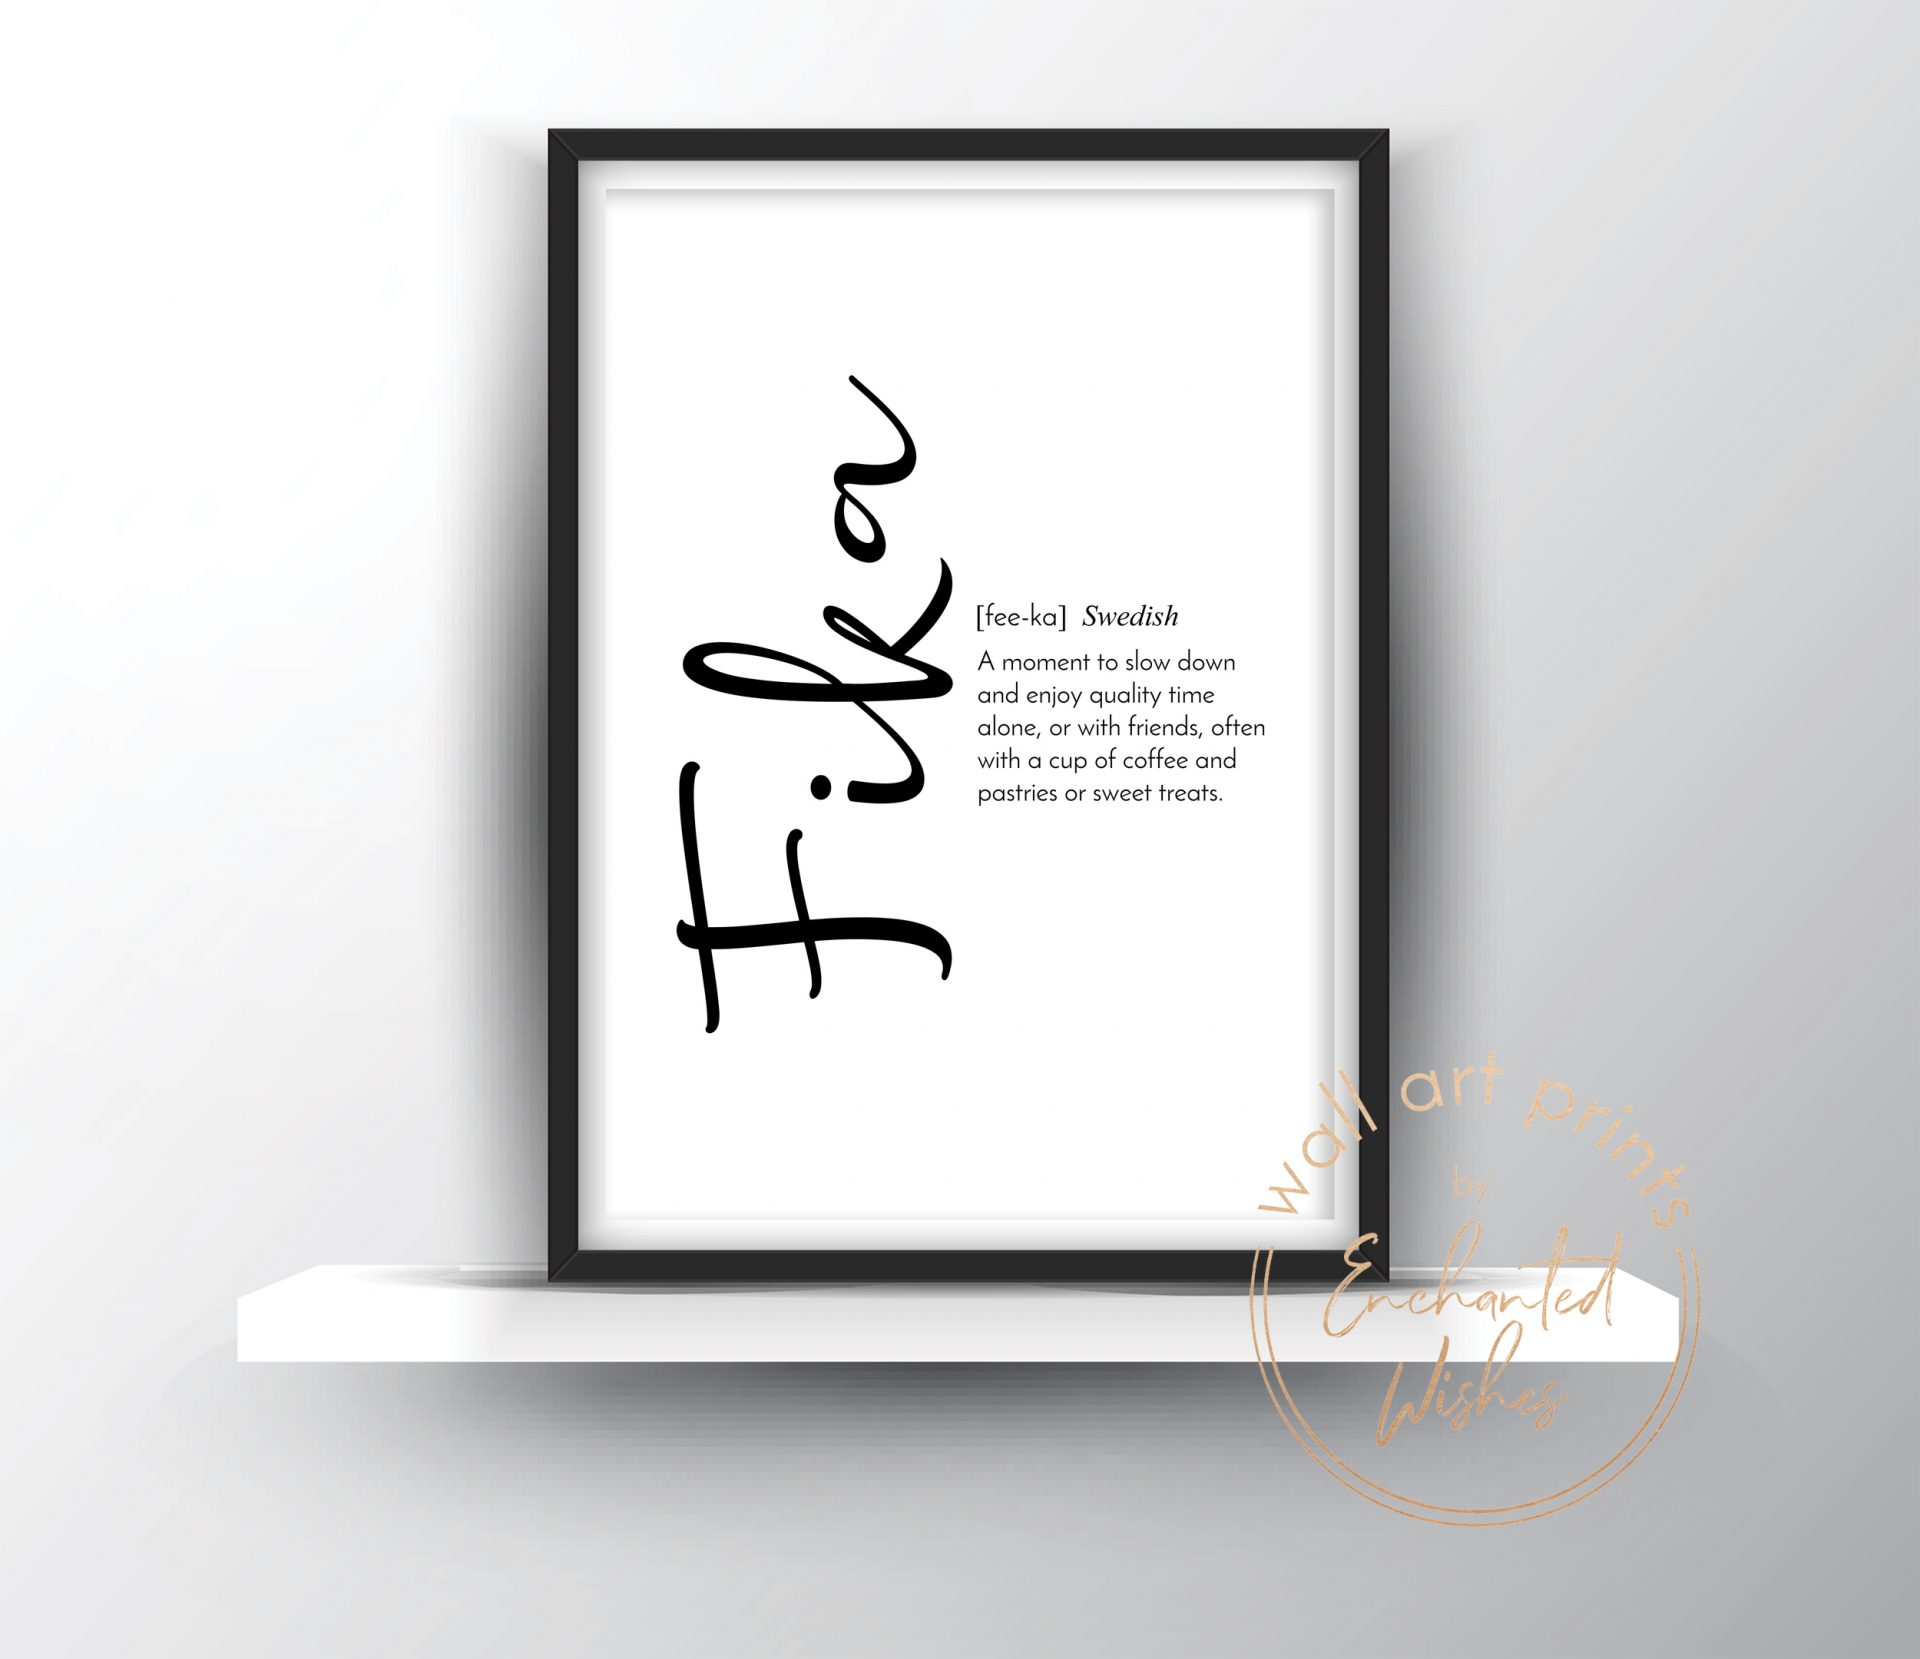 Fika definition print